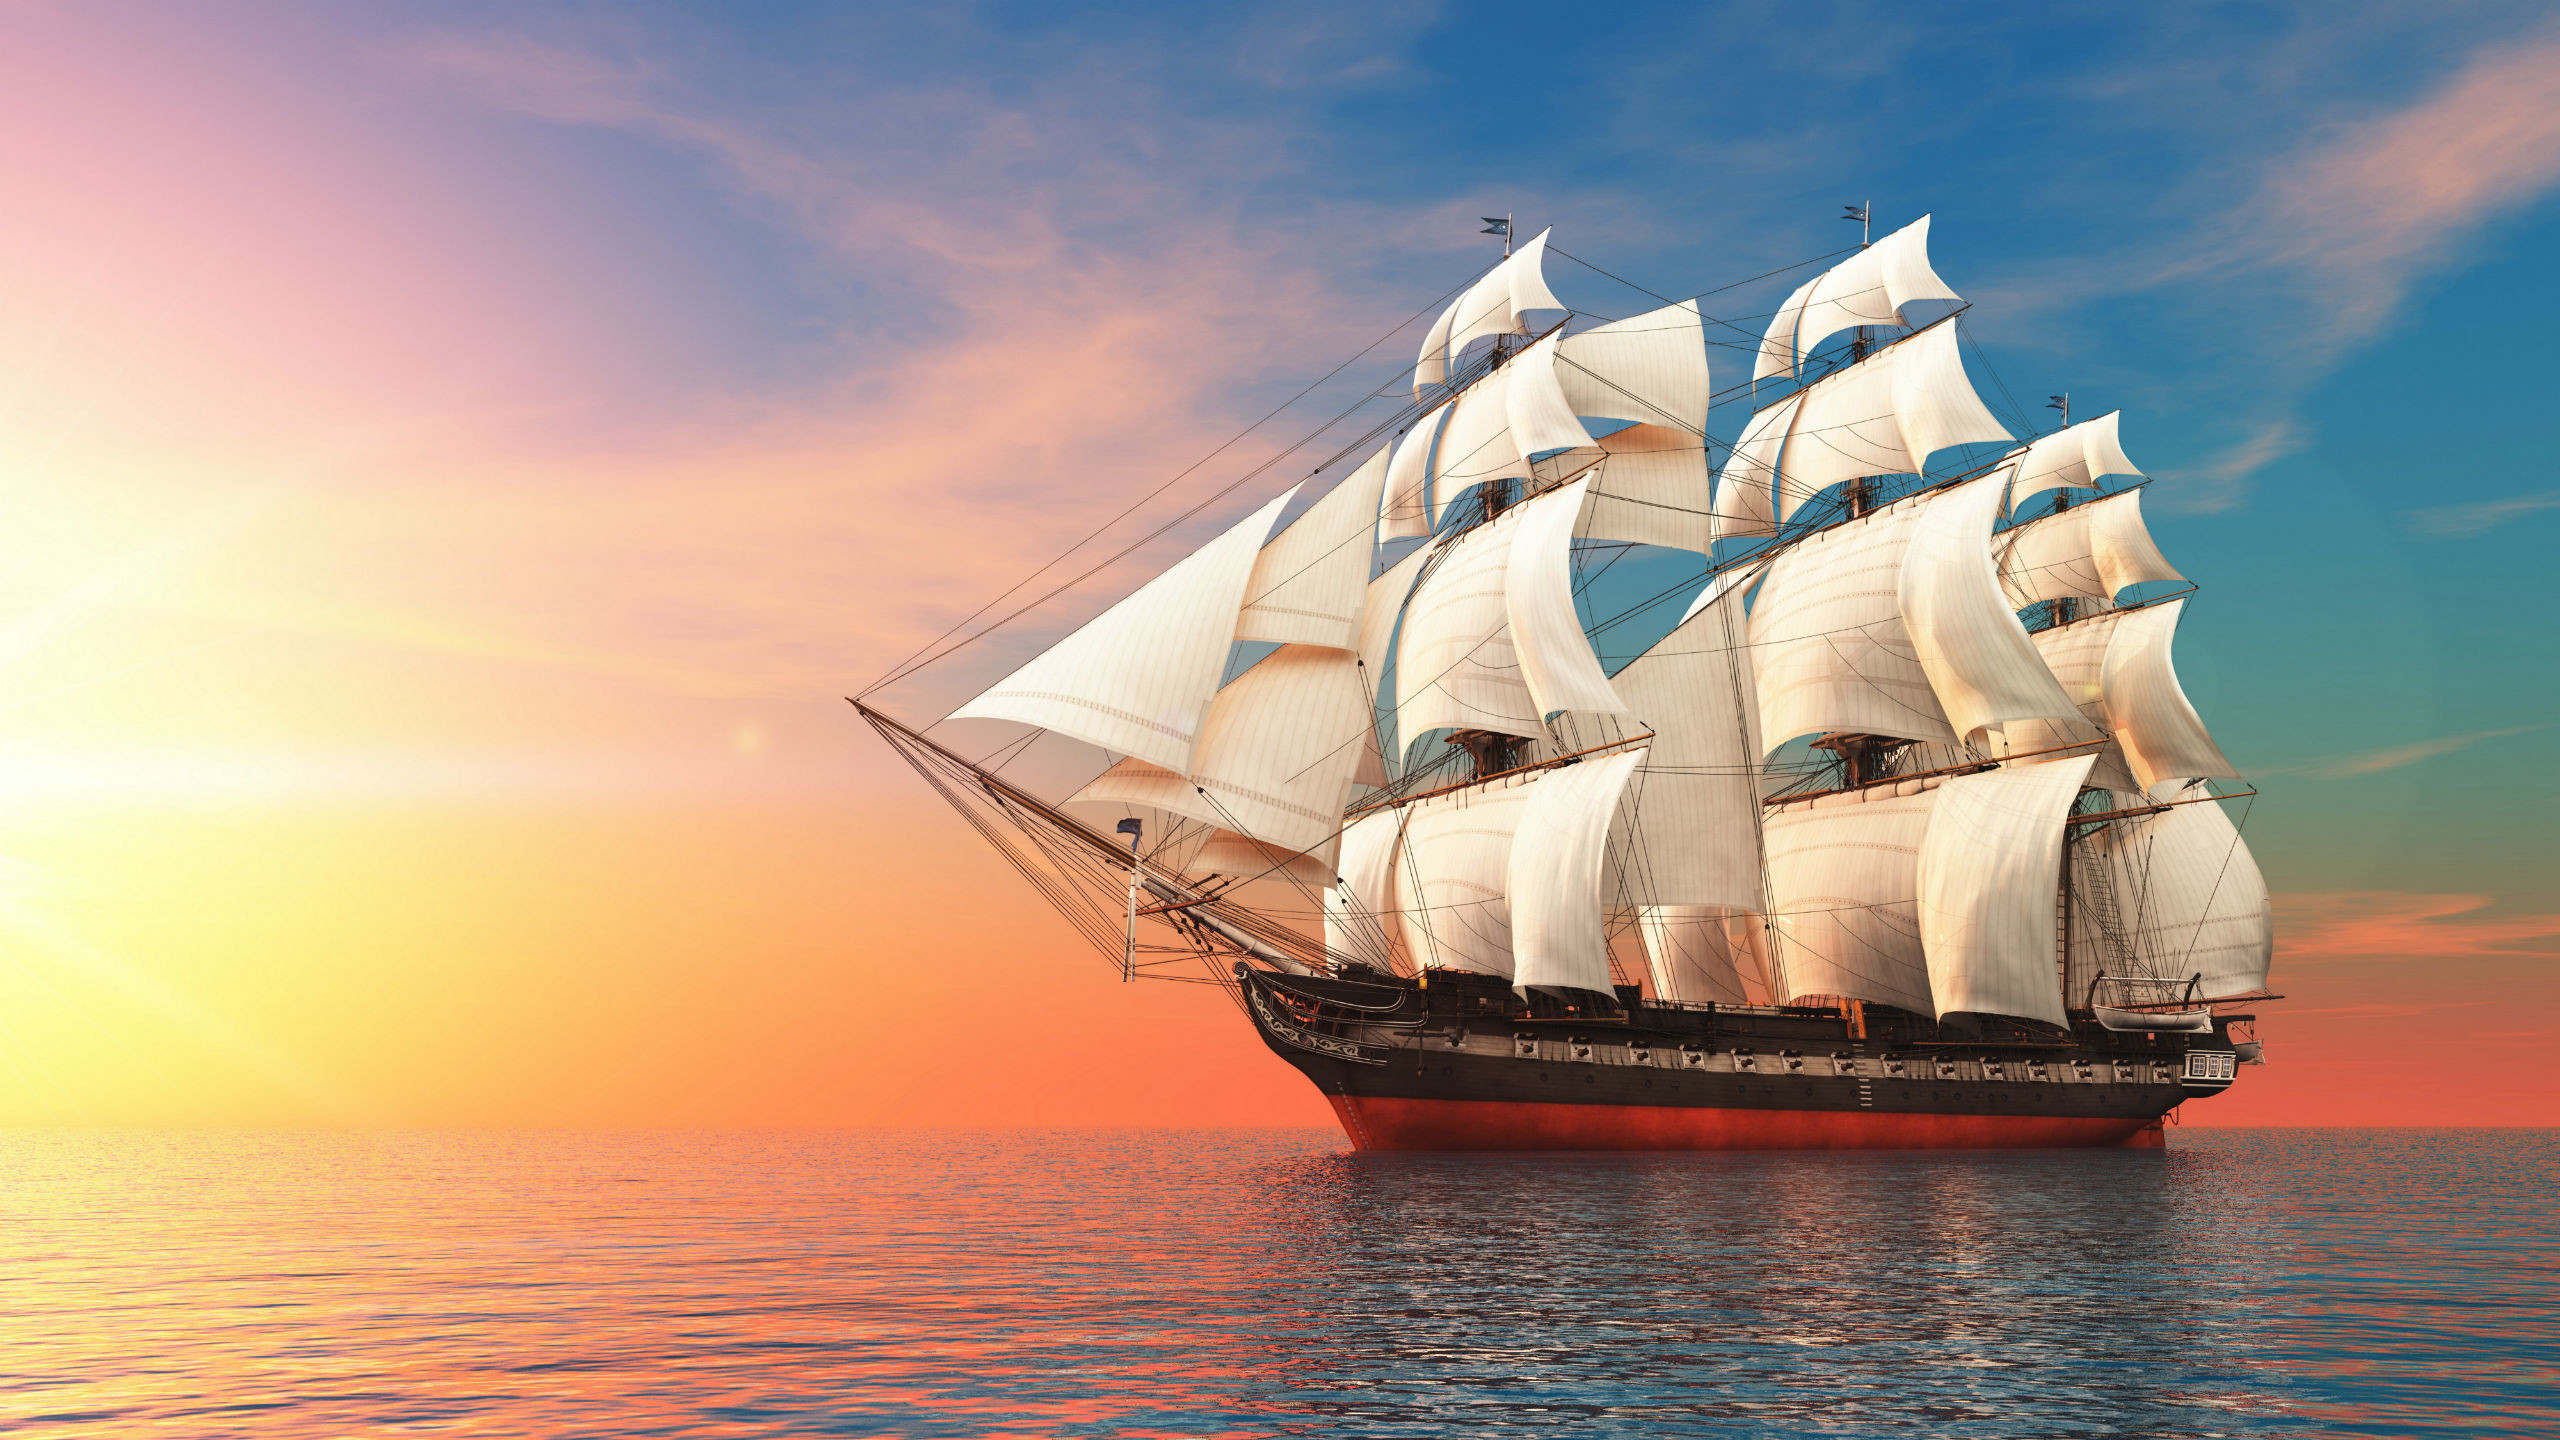 Ship HD Wallpapers Backgrounds Wallpaper